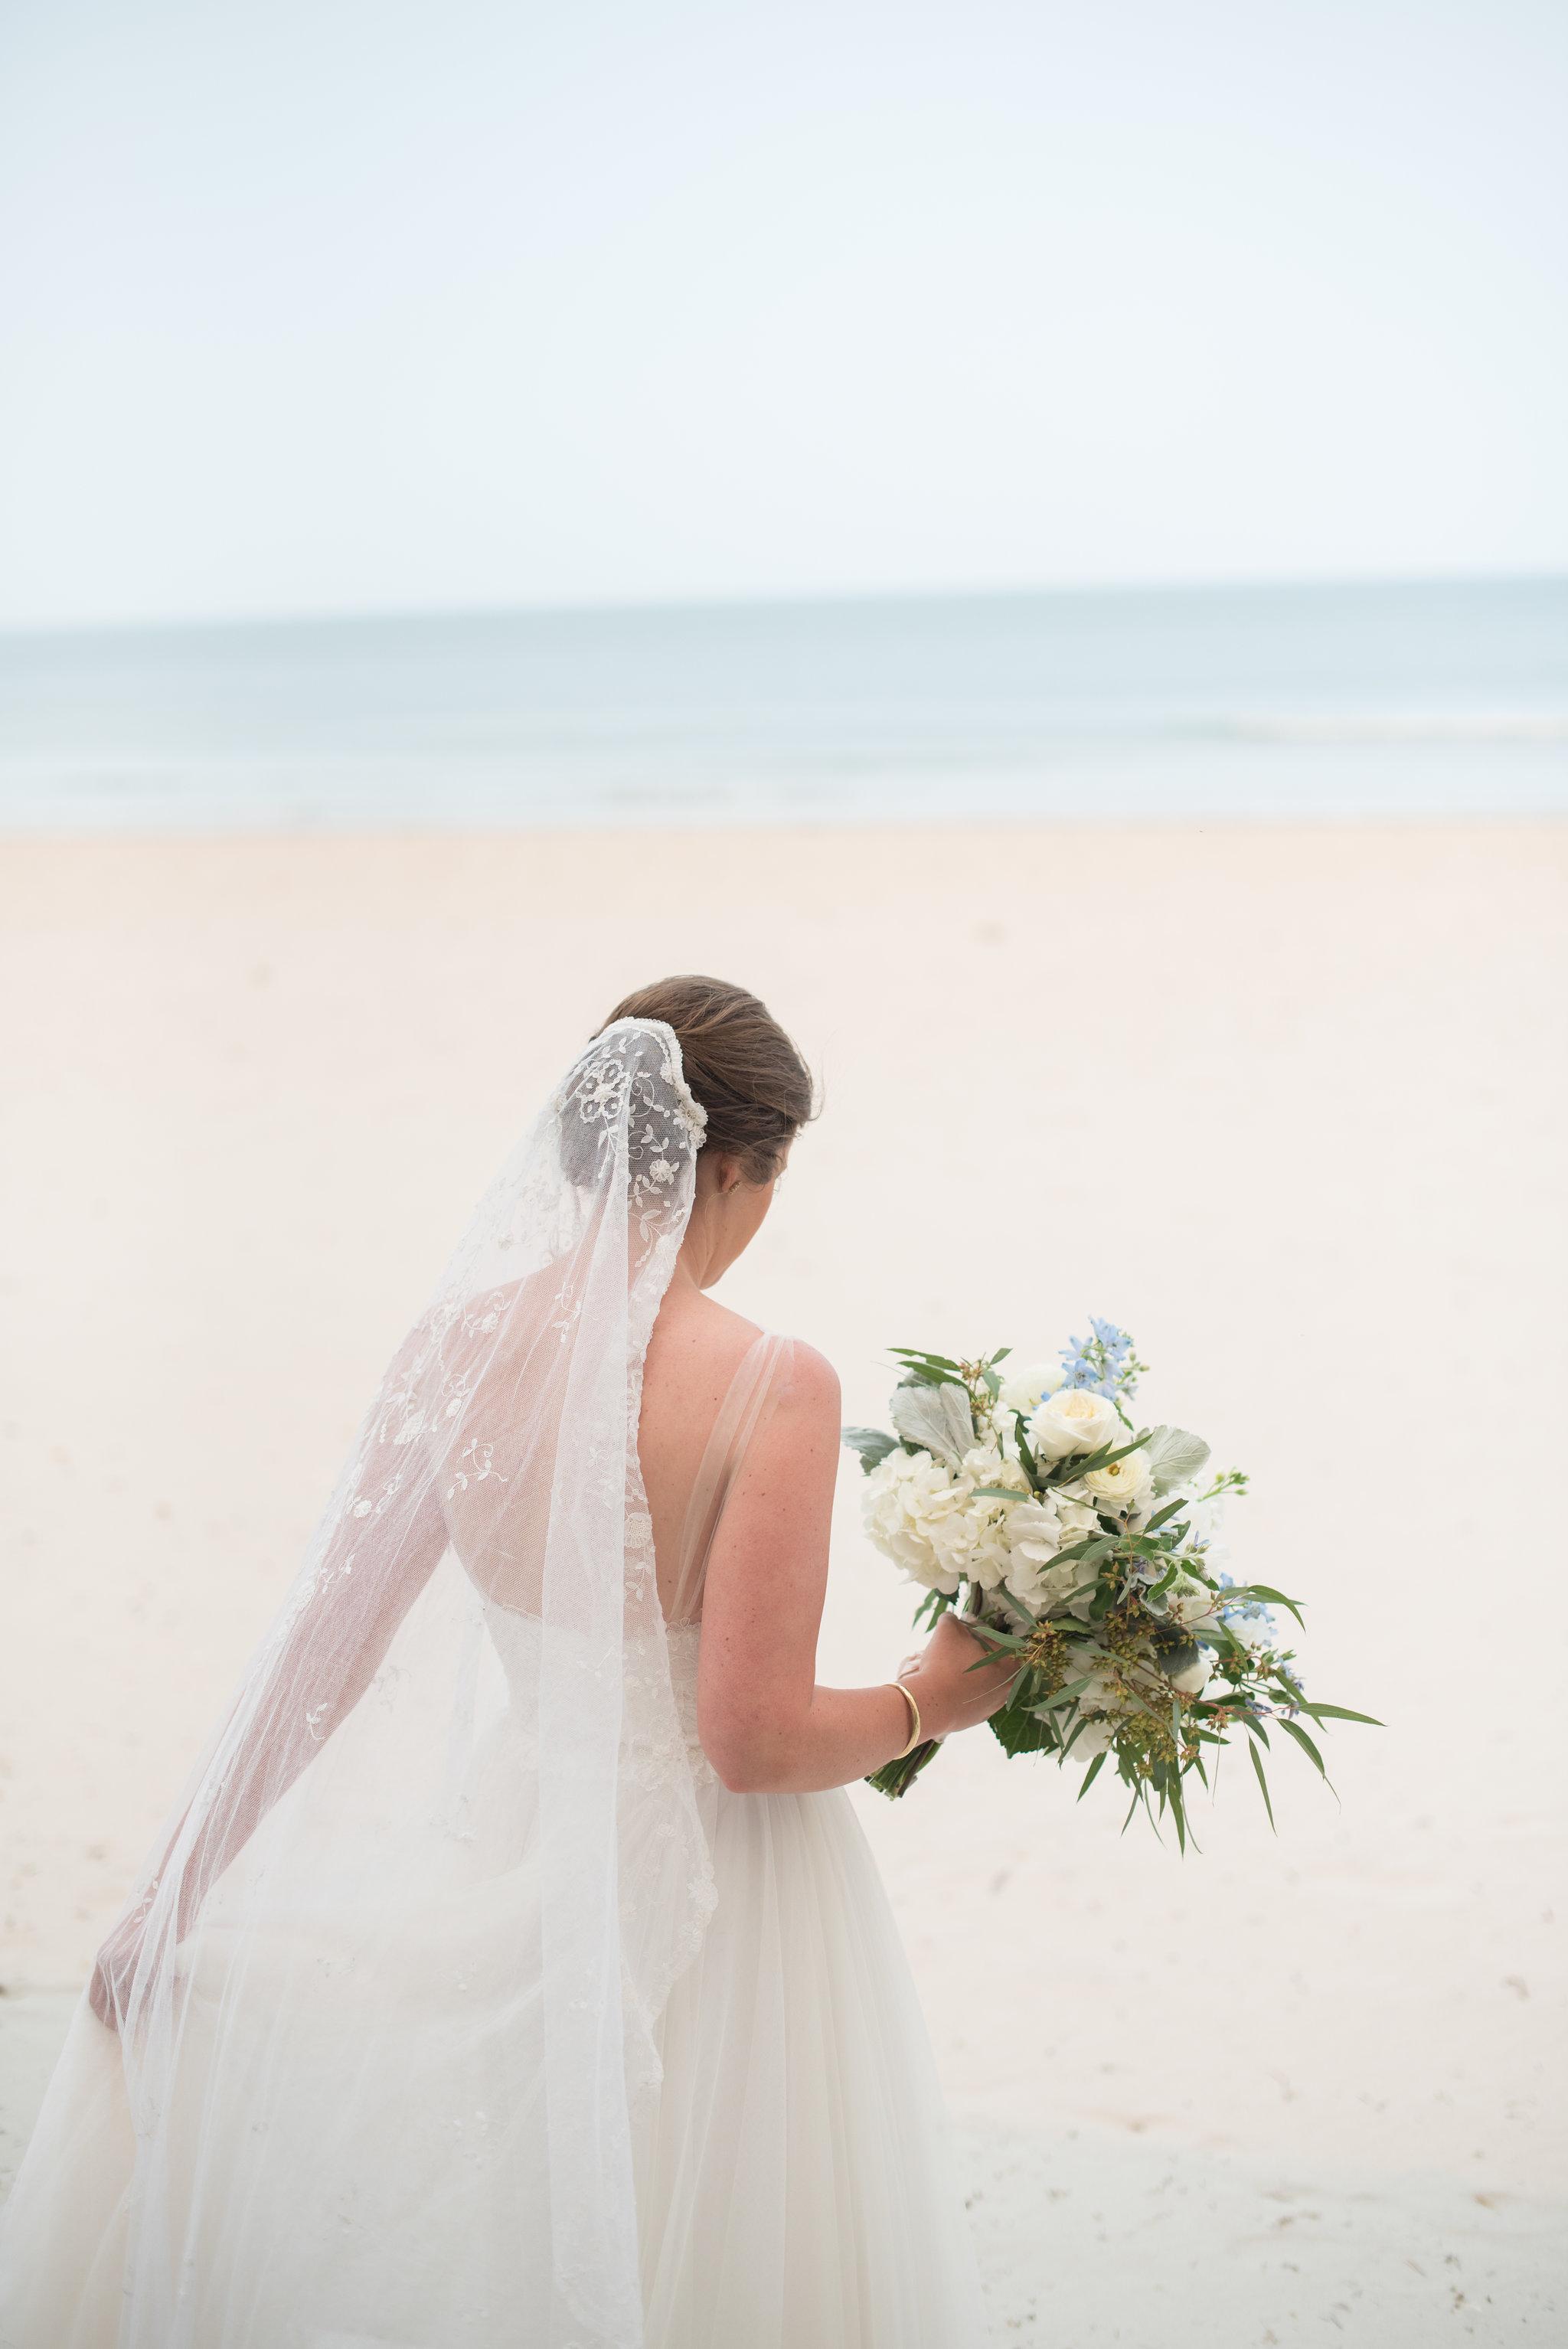 st-augustine-wedding-photographer-sarah-annay-photography.jpg30.jpg